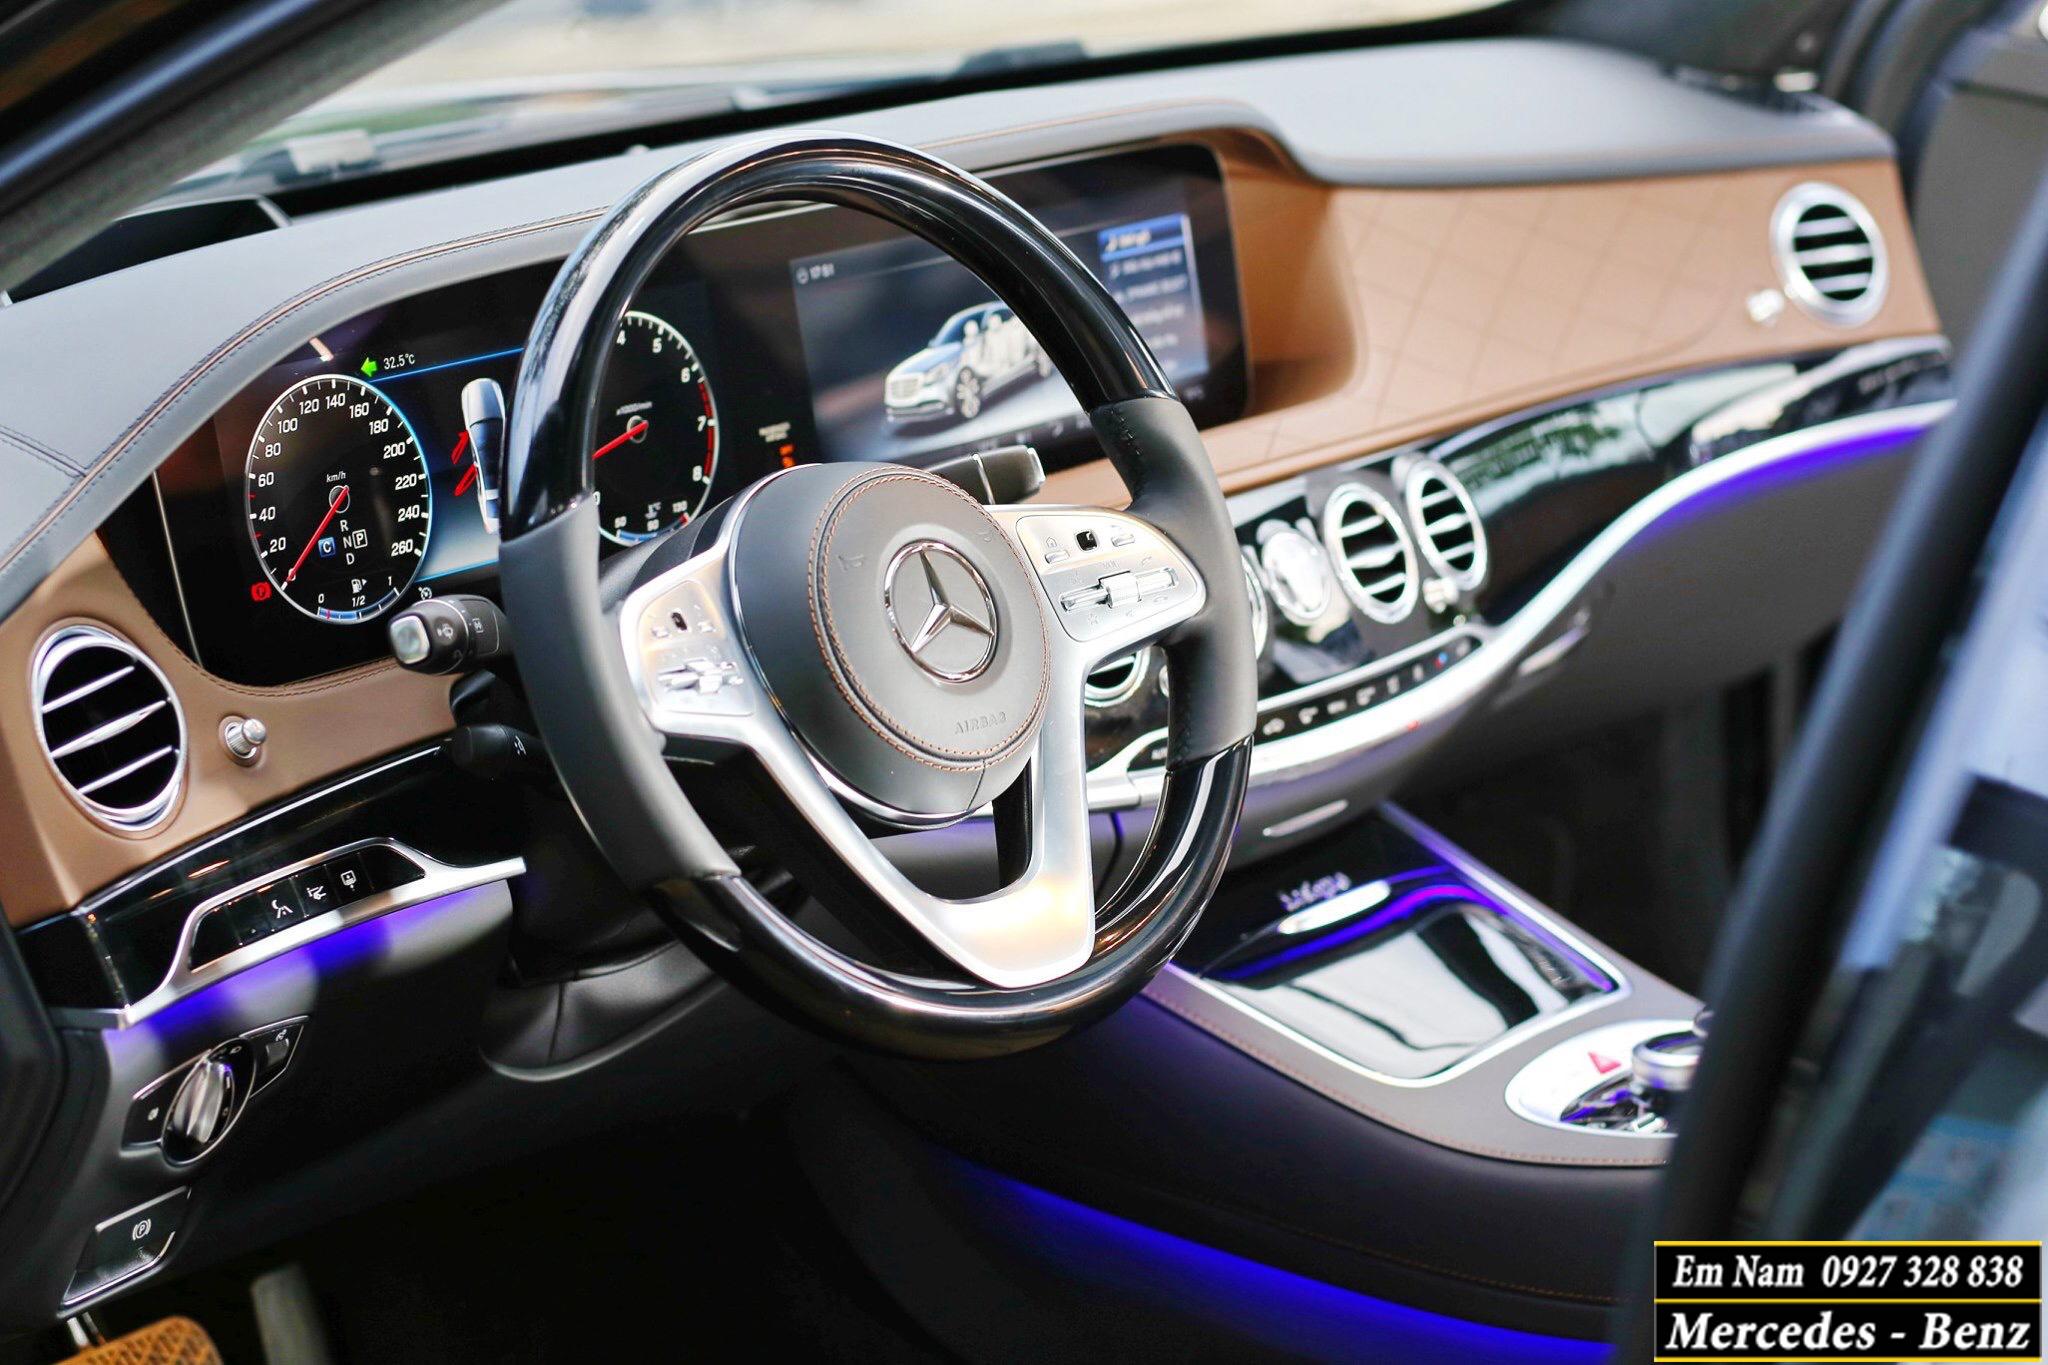 noi-that-mercedes-s450-l-luxury-mercedes-hai-phong-1